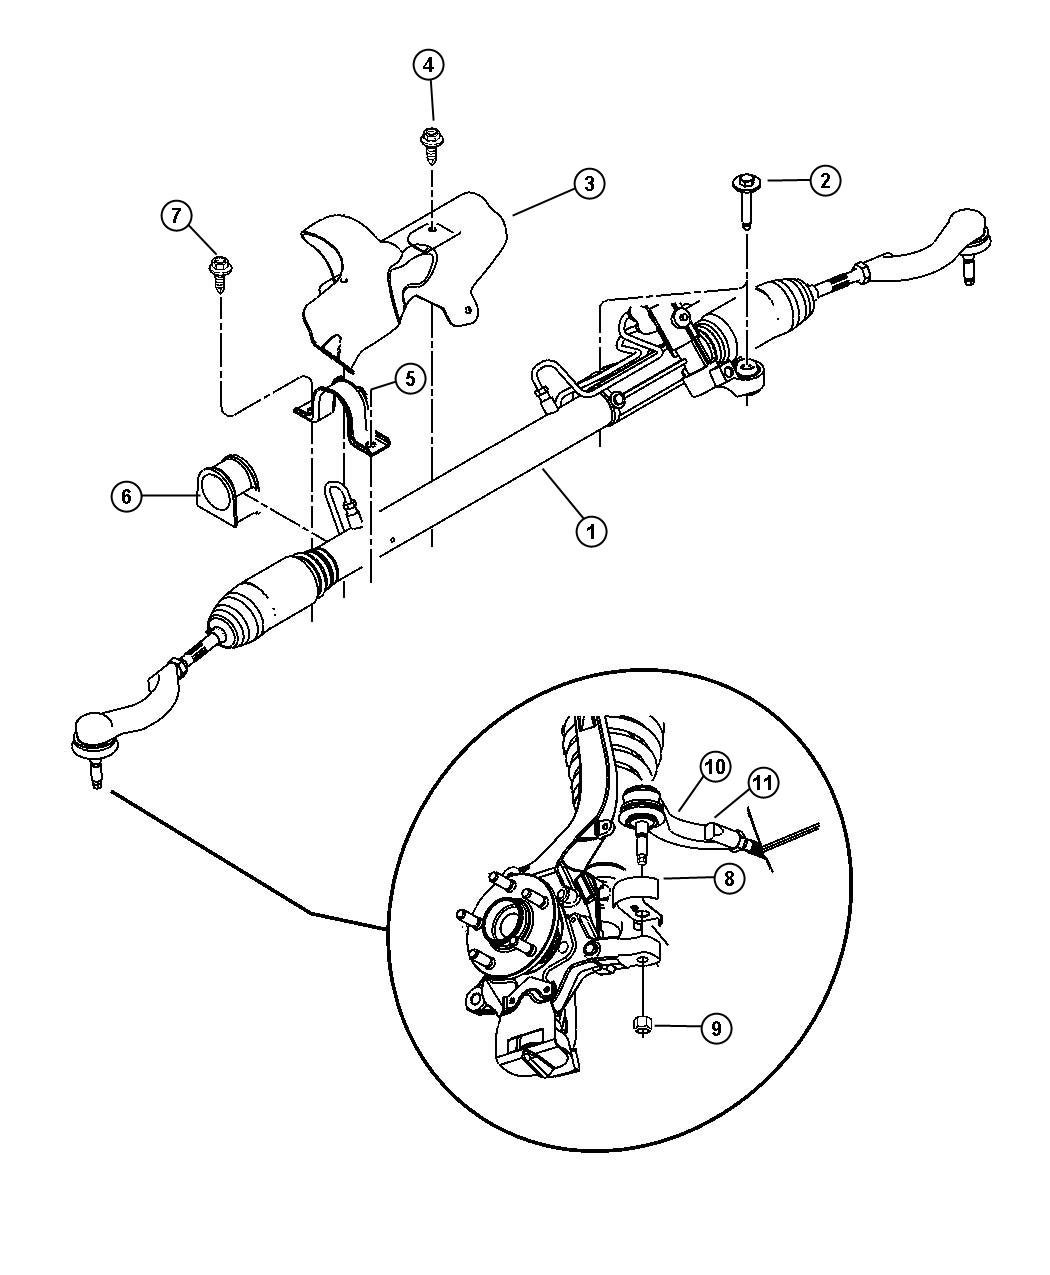 Chrysler Sebring Gear Rack Amp Pinion Power And